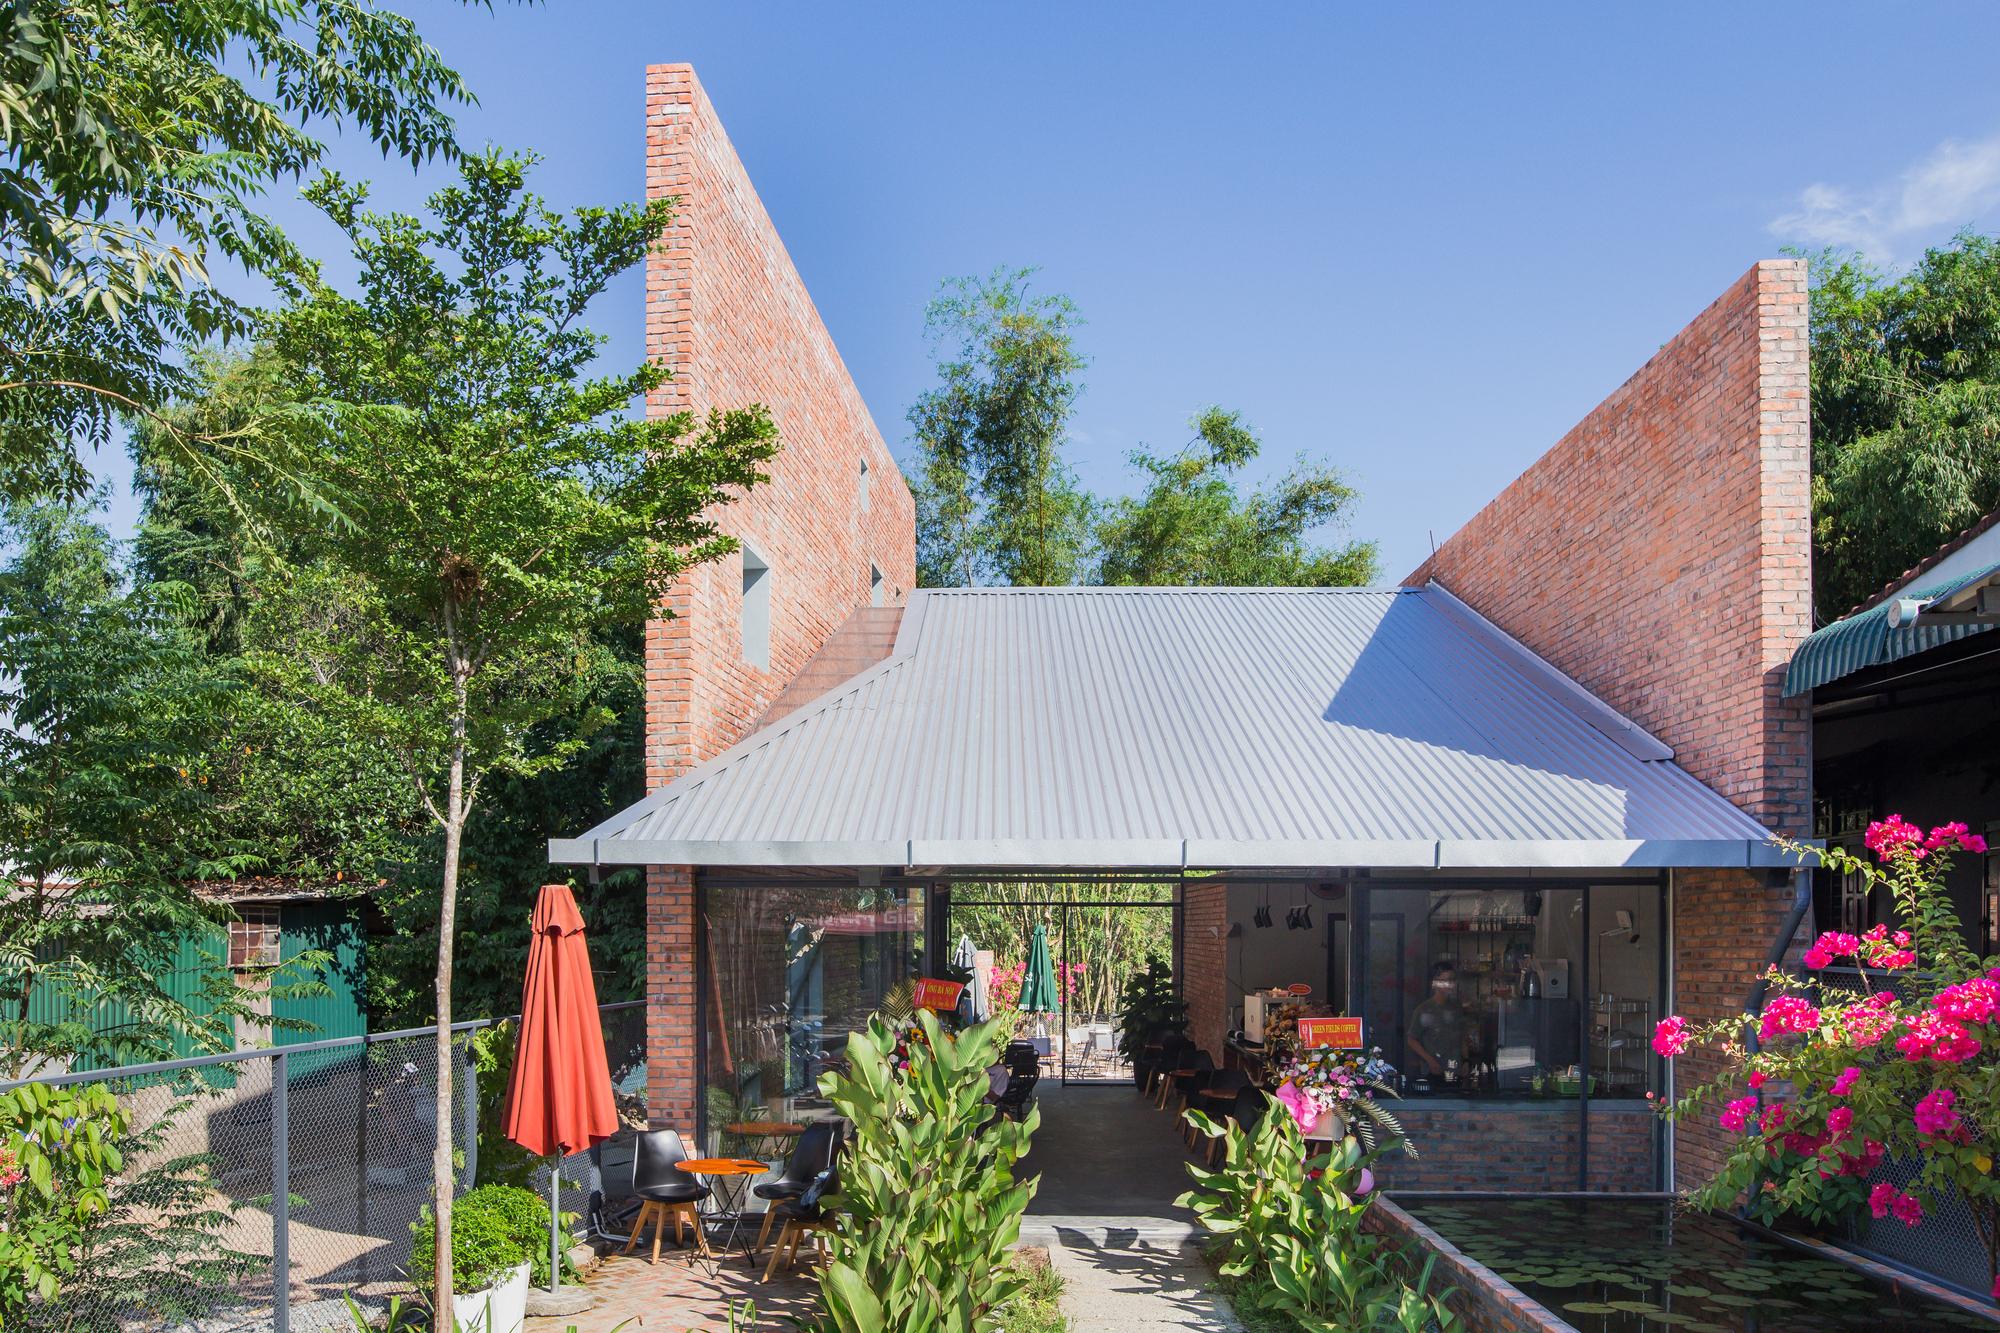 Kate's Kafe / TON Architects